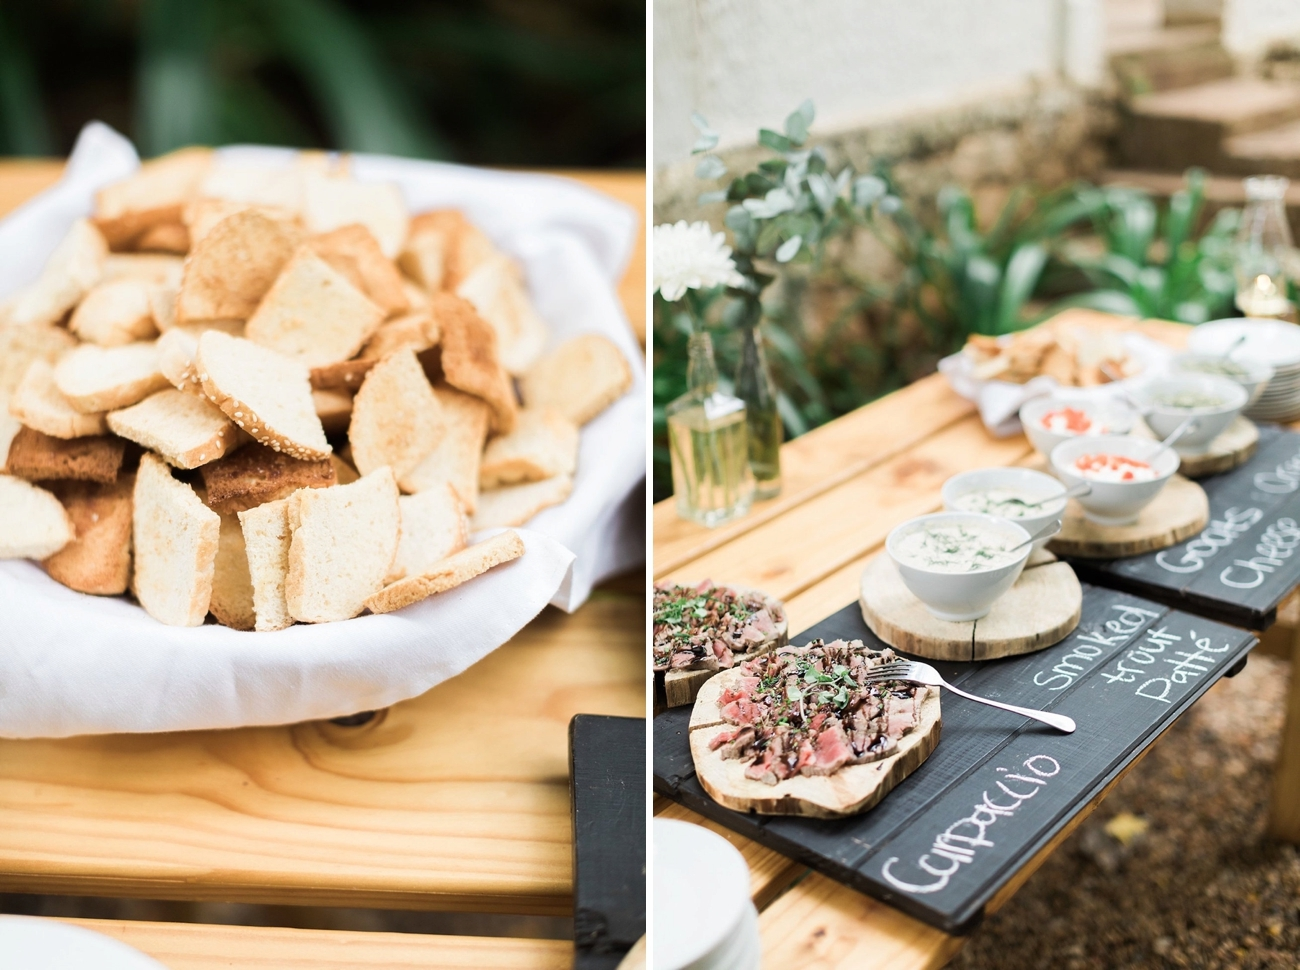 Wedding Food Tapas Style | Image: Alicia Landman